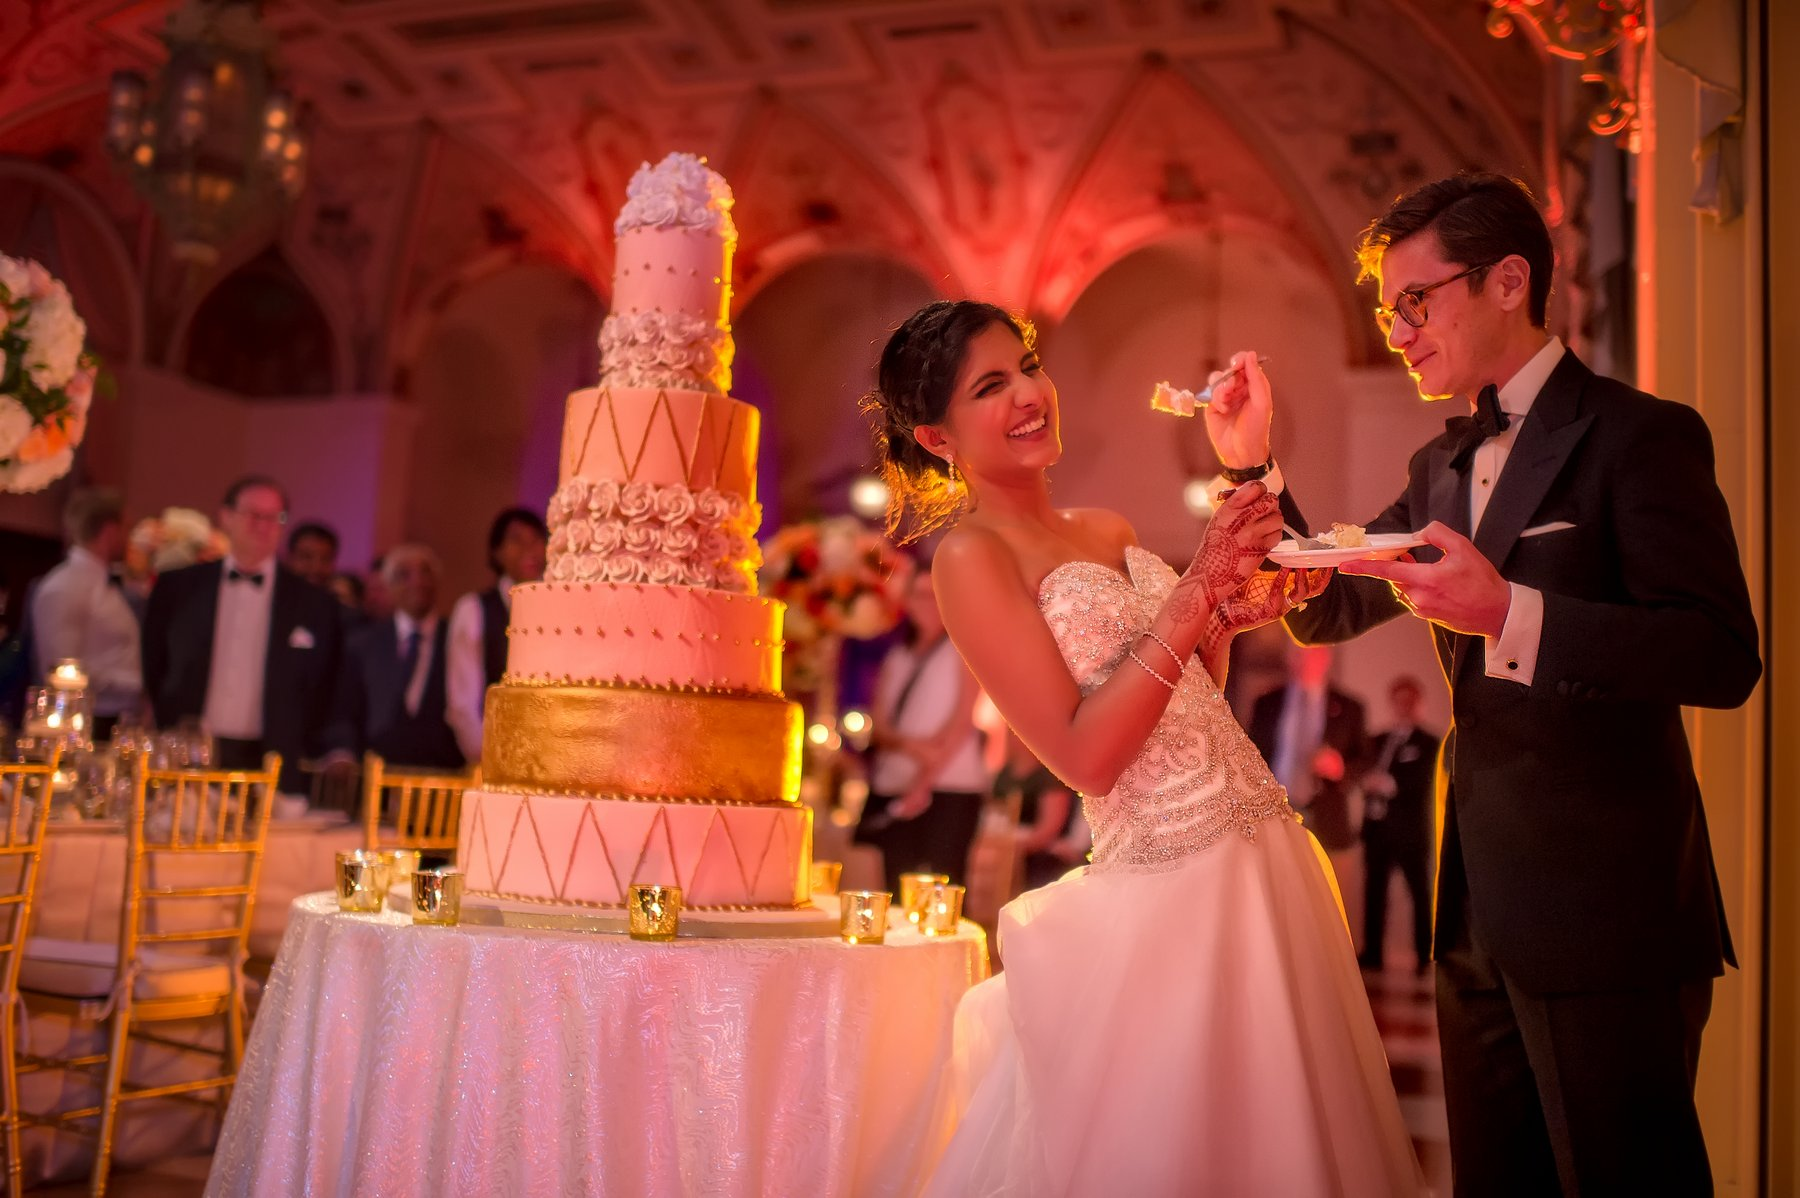 Chiki and Brandon, Miami Wedding Photographers | Häring Photography, Indian Wedding Photographer in Florida, Best Muslim, Hindu - South East Asian Wedding Photographers